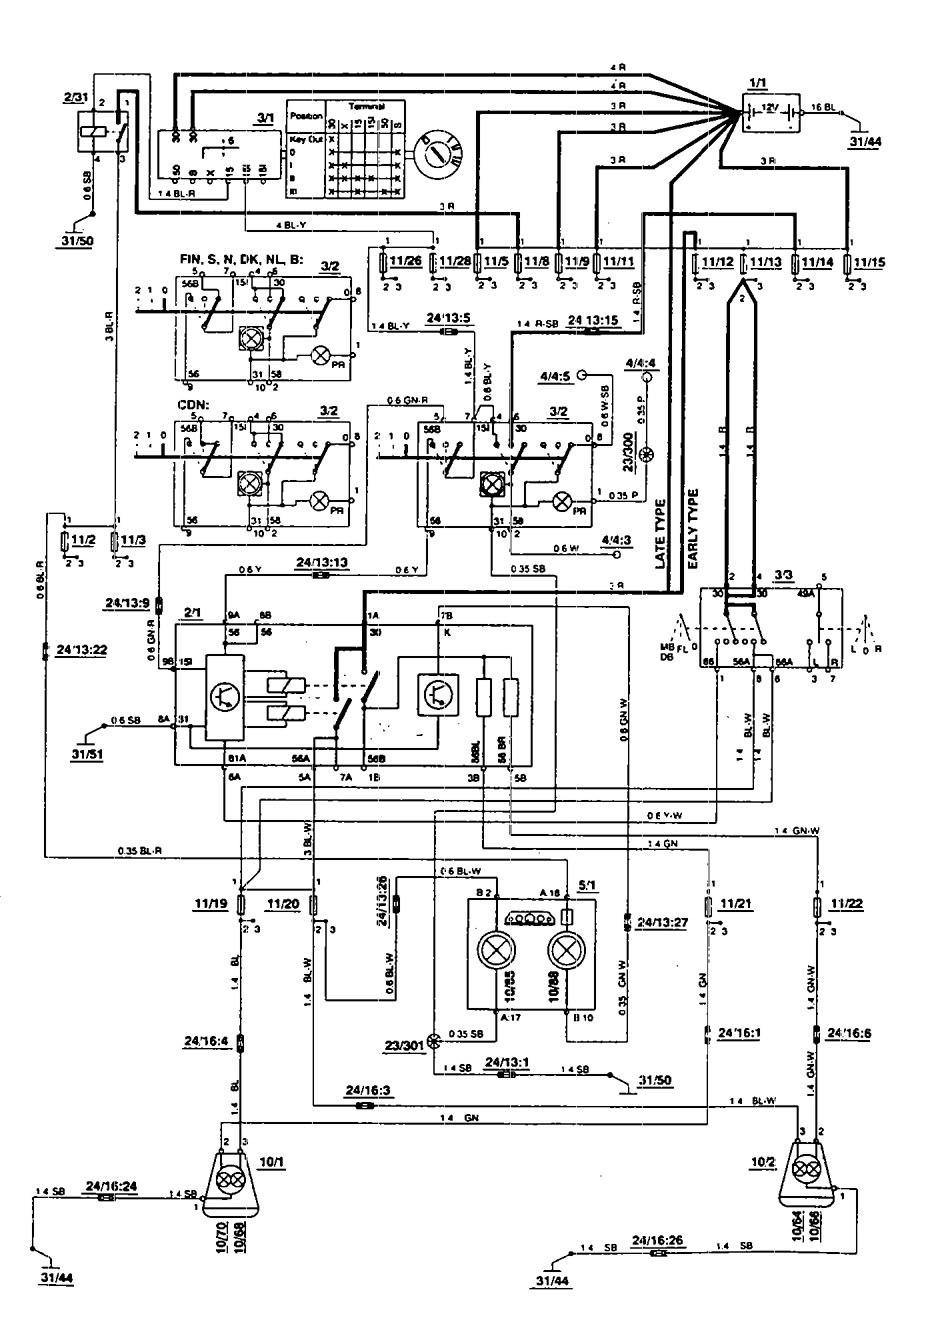 YL_0175] Diagram Also Volvo 850 Wiring Diagram Together With Wiring Diagram  Wiring Diagram | Volvo 850 Instrument Panel Wiring Diagram |  | Weasi Intel Monoc Iosco Bemua Mohammedshrine Librar Wiring 101